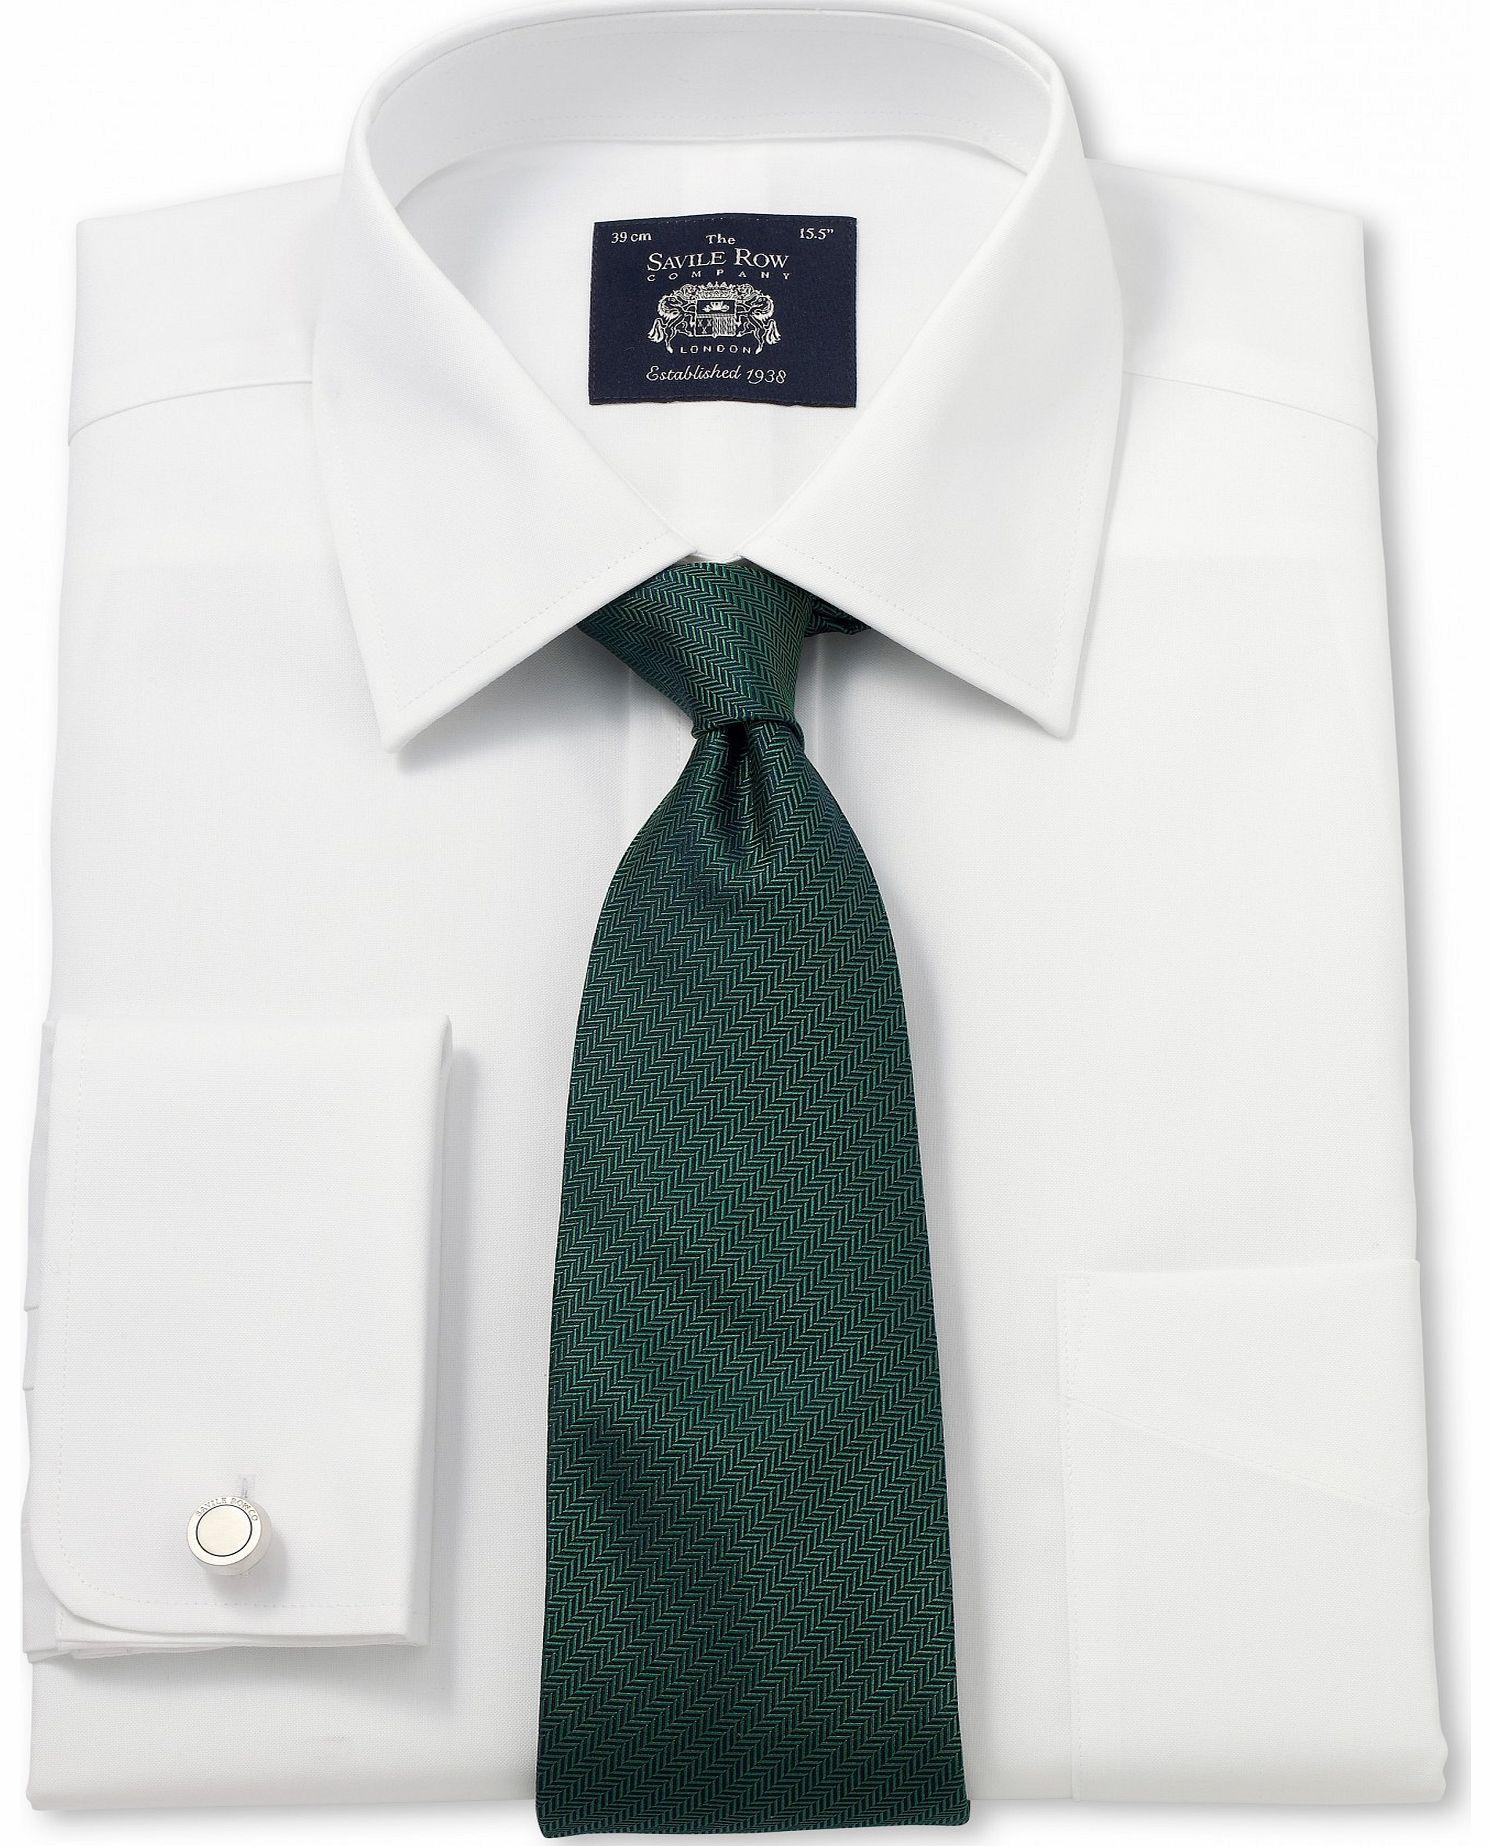 Savile Row Company White Non Iron Classic Fit Shirt 16 1 2